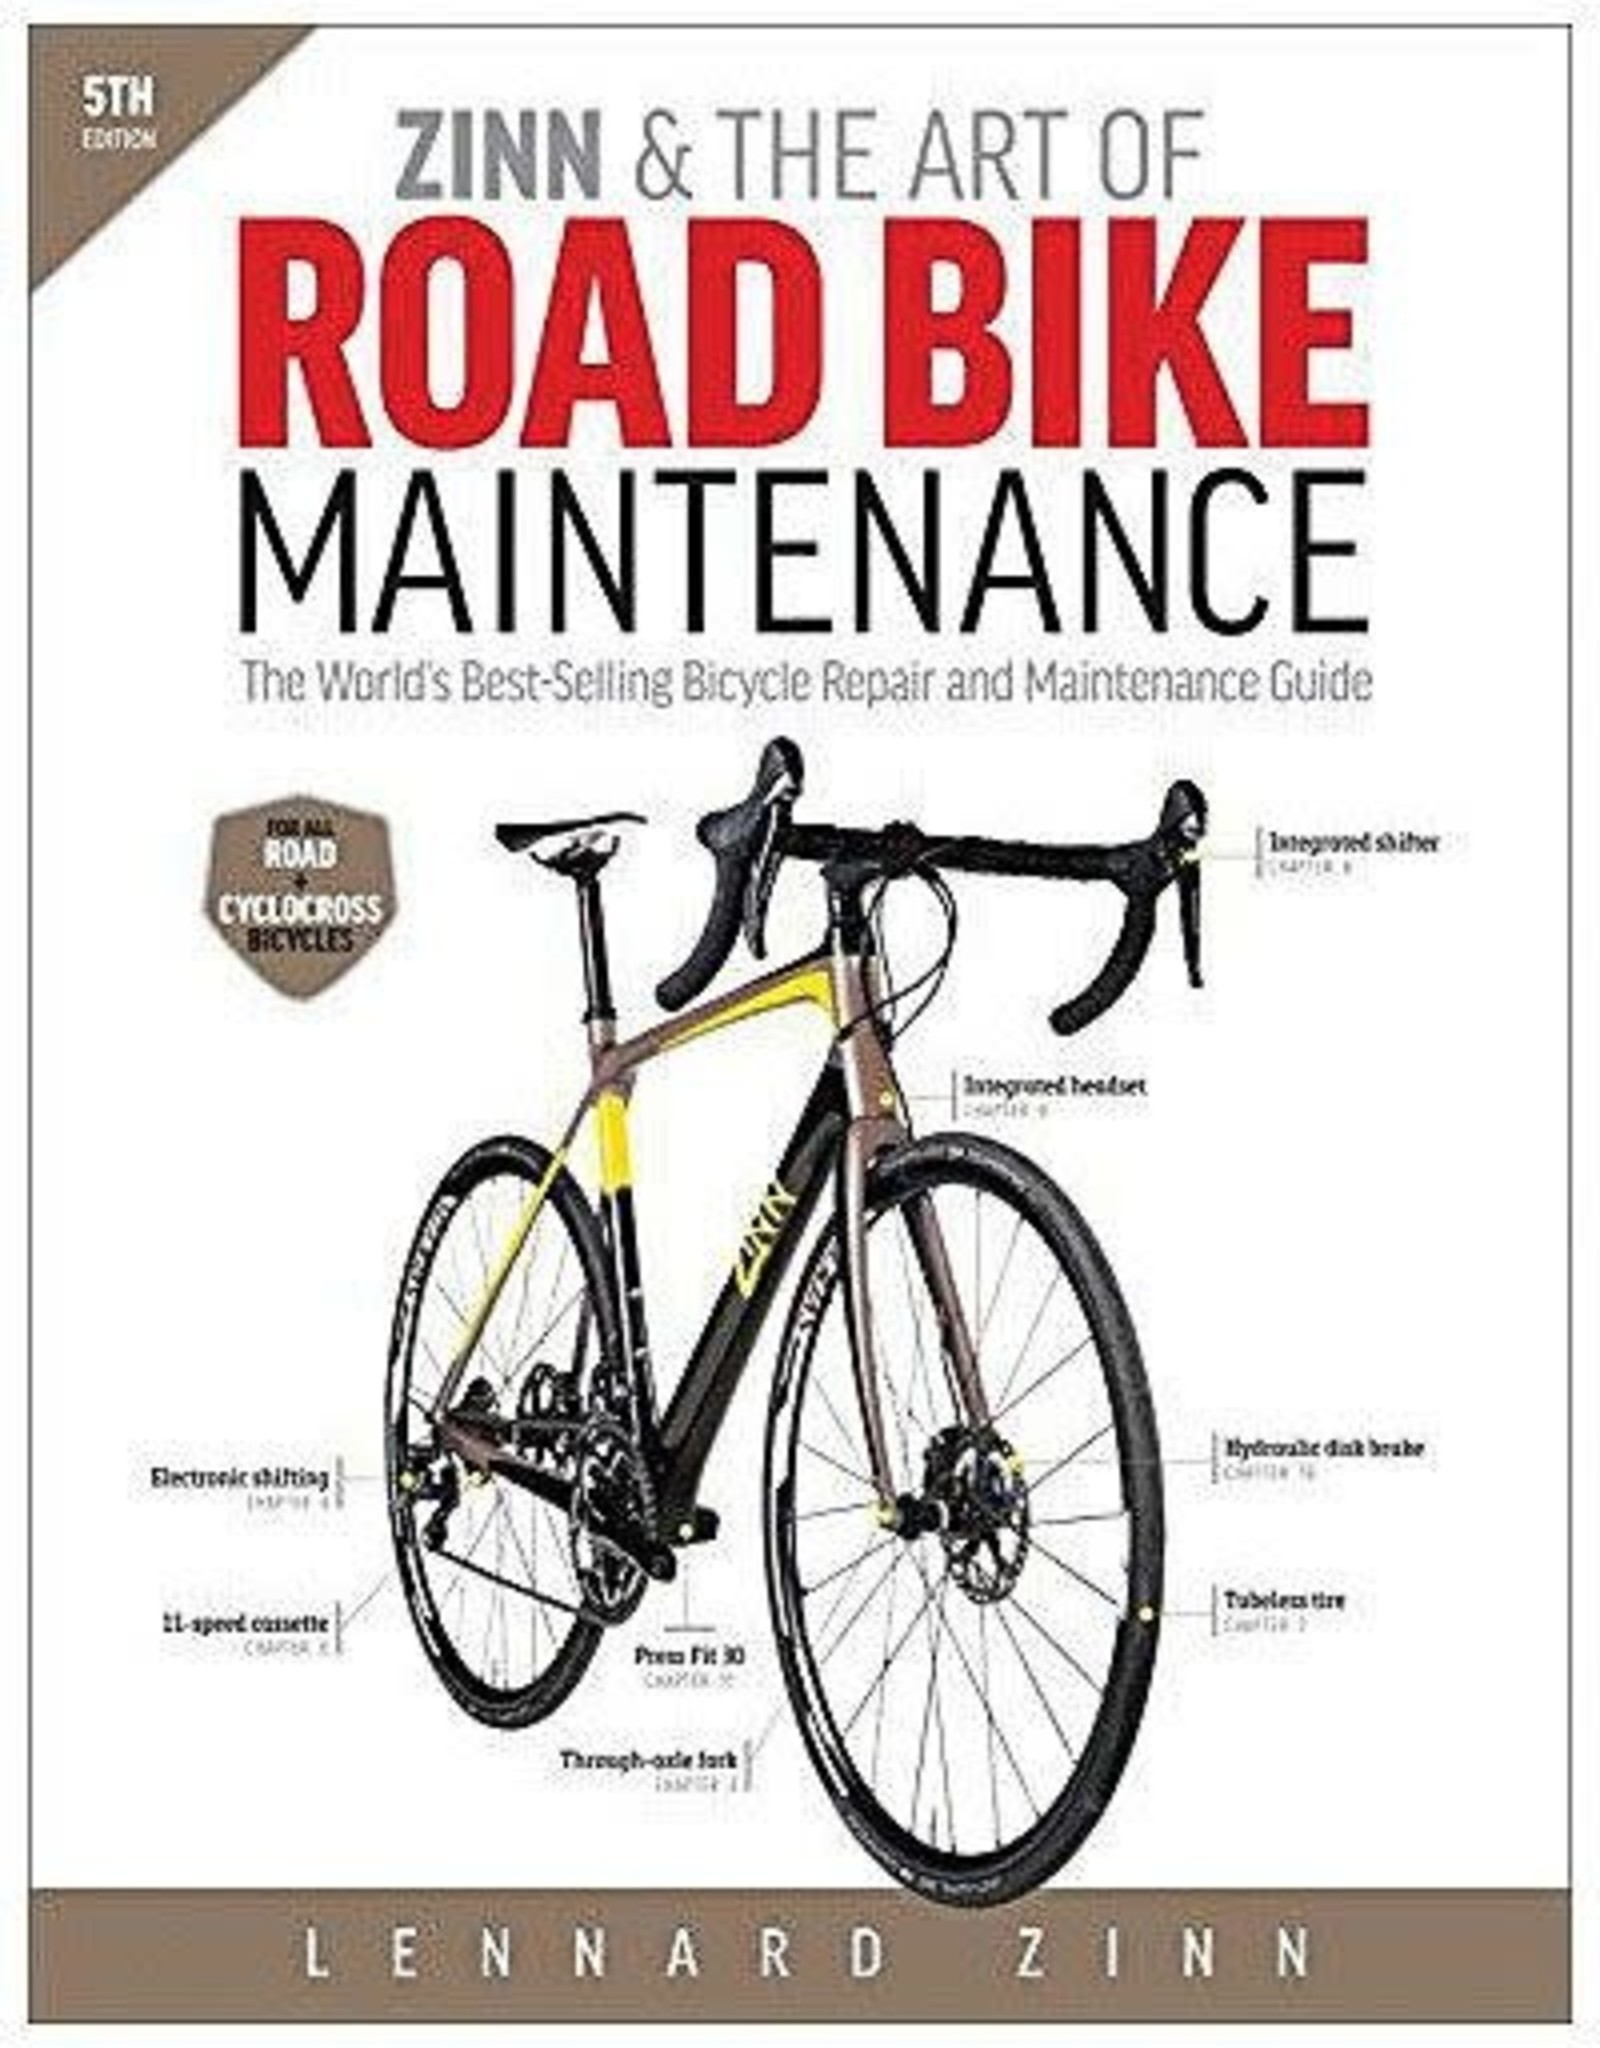 Velopress Zinn & The Art of Road Bike Maintenance by Lennard Zinn